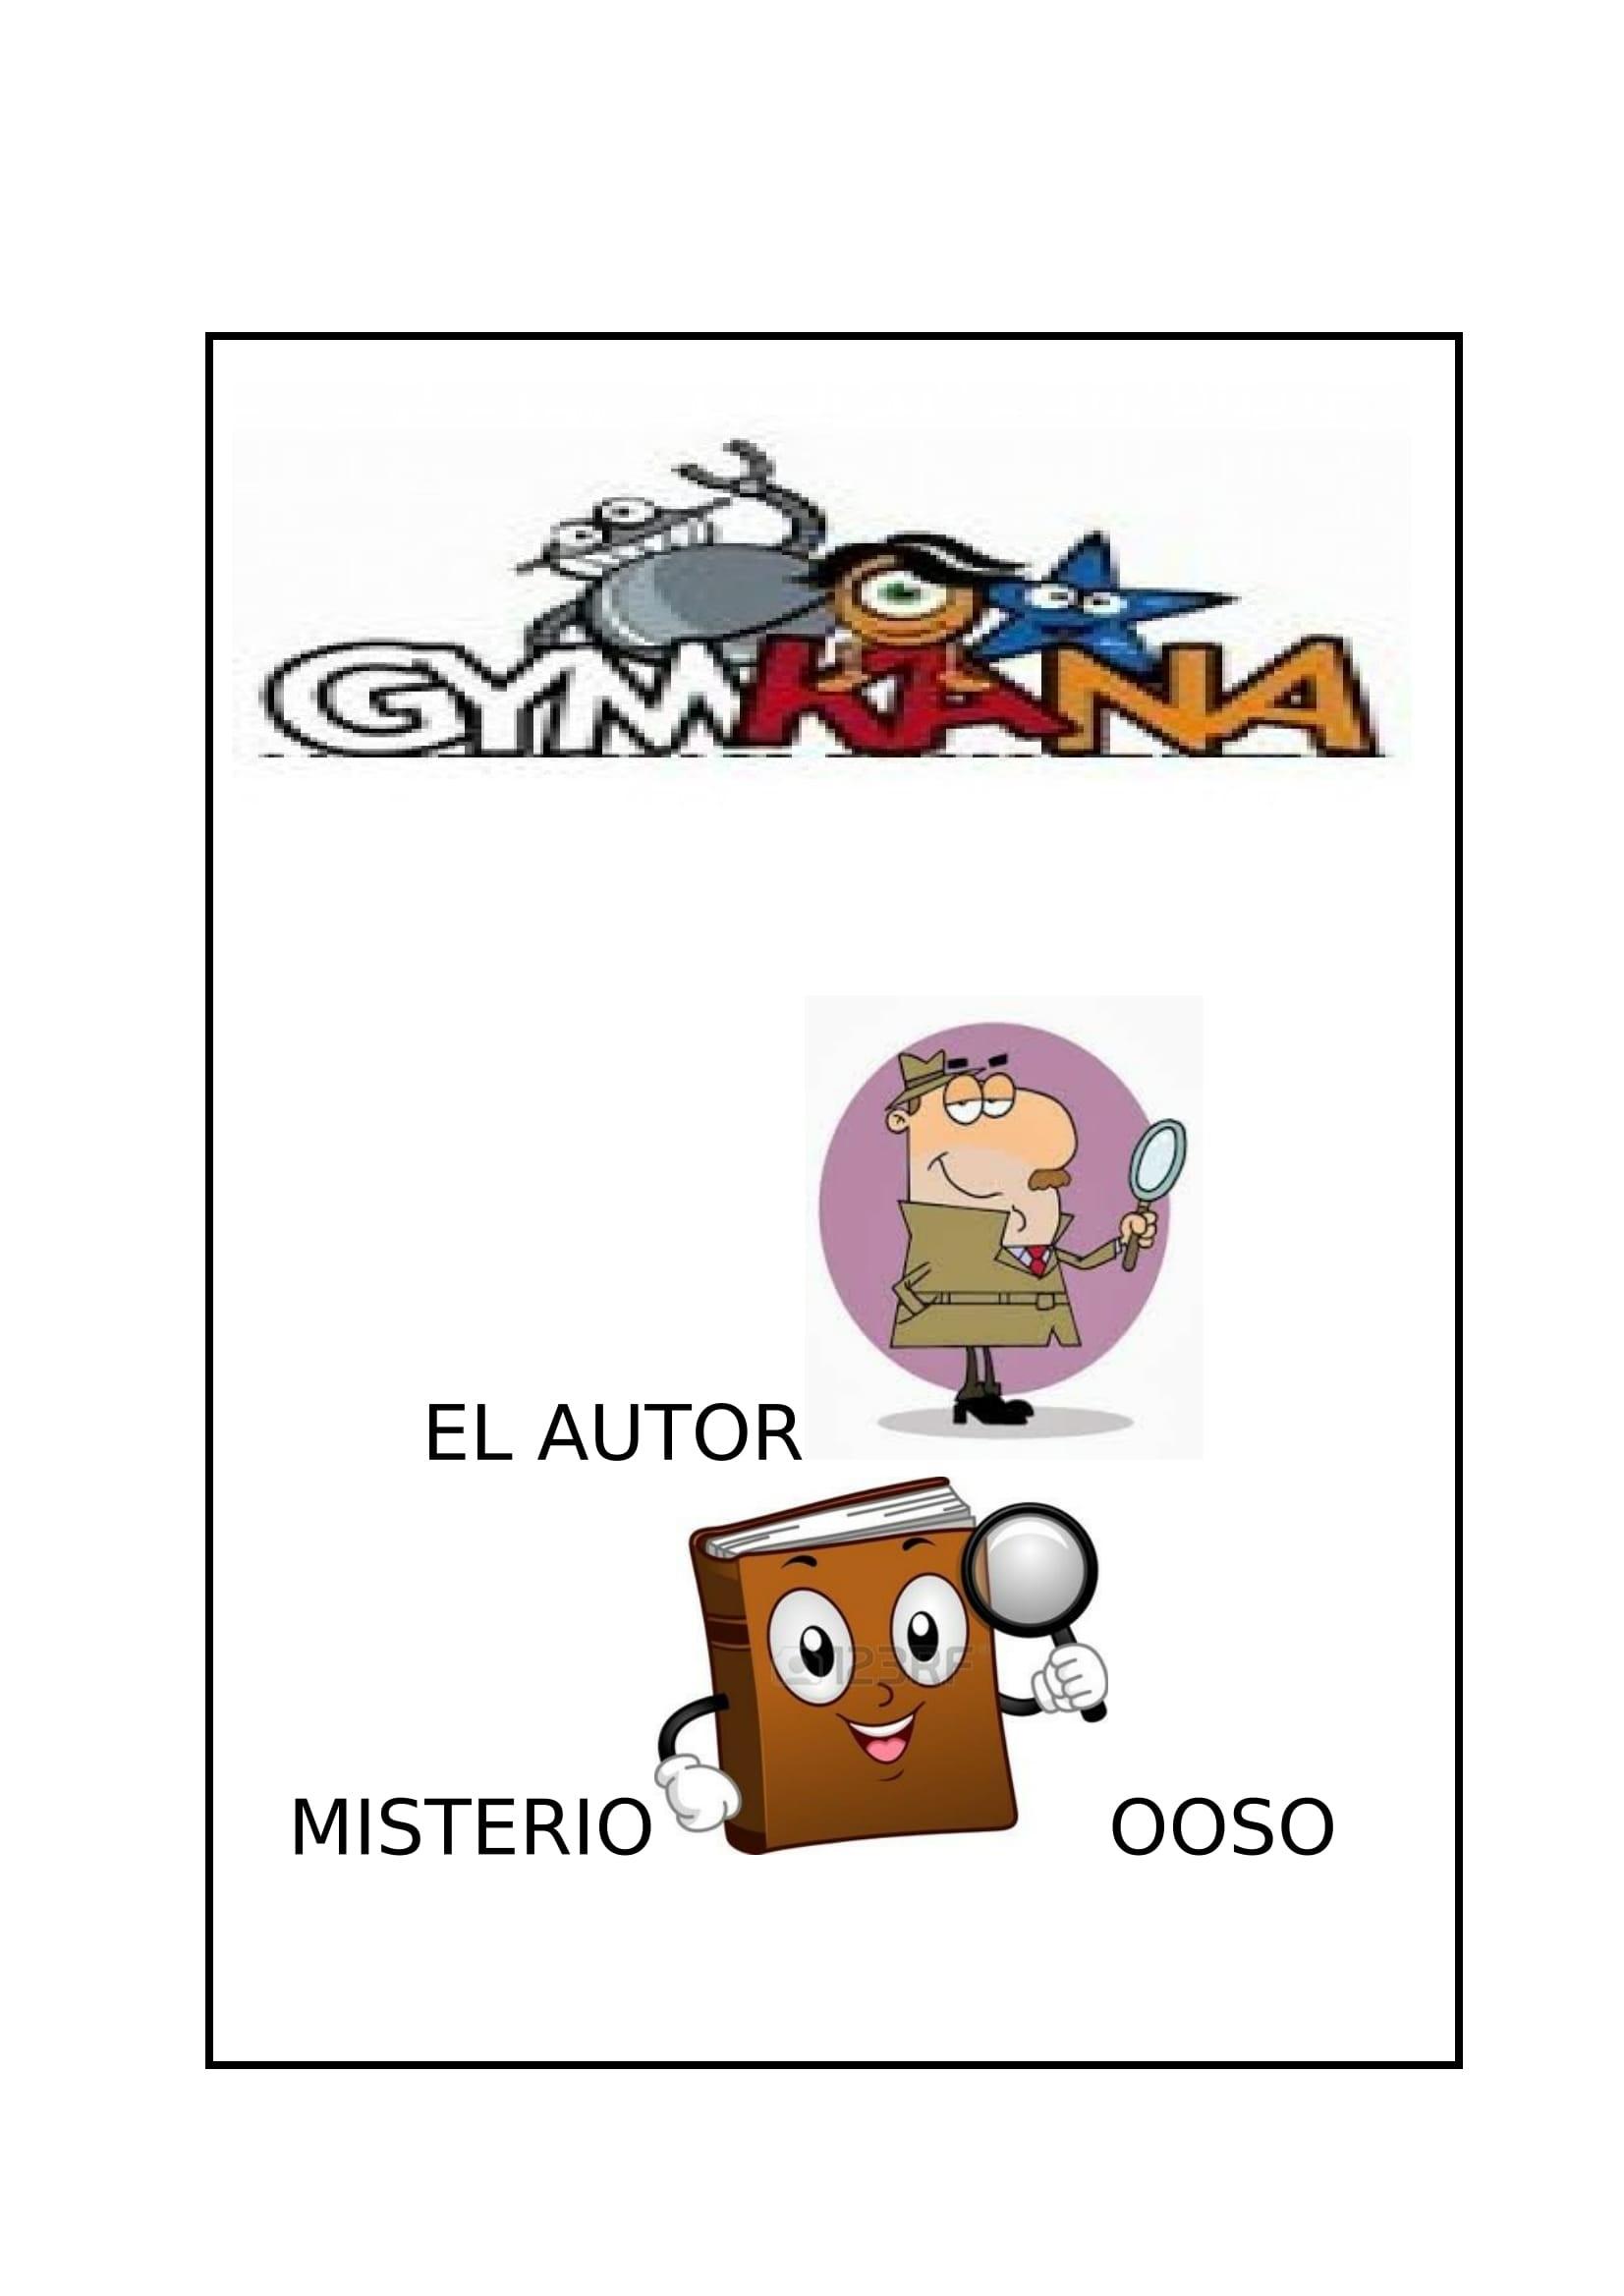 II Gymkana: El Autor Misterioso